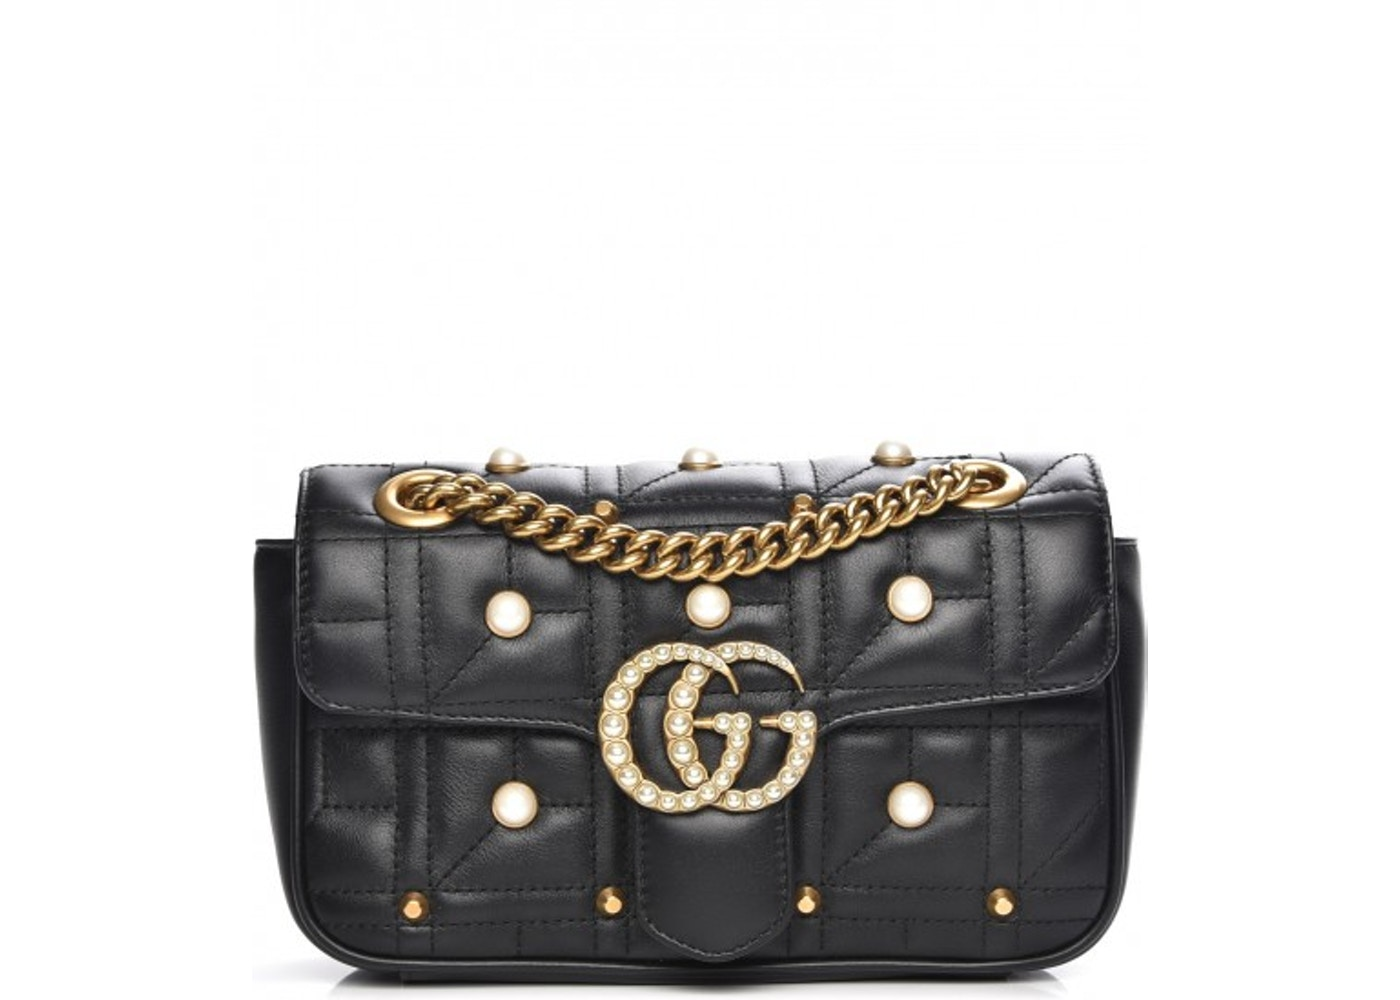 b3b6c23886e Gucci Marmont Shoulder Bag Matelasse Pearl Studded Mini Black. Matelasse  Pearl Studded Mini Black